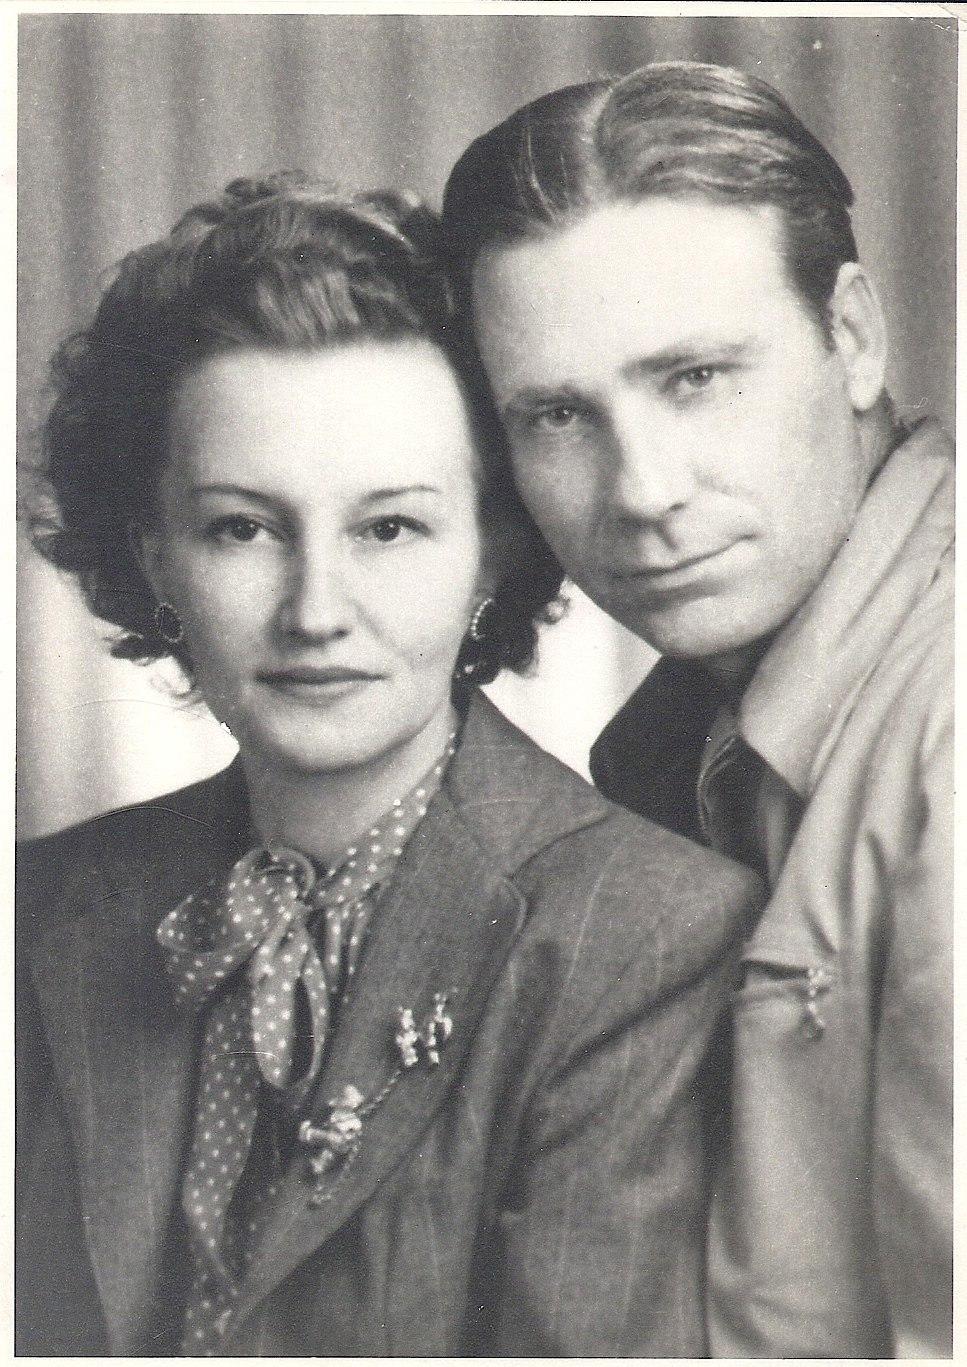 Gladys clyde wedding photo 1948